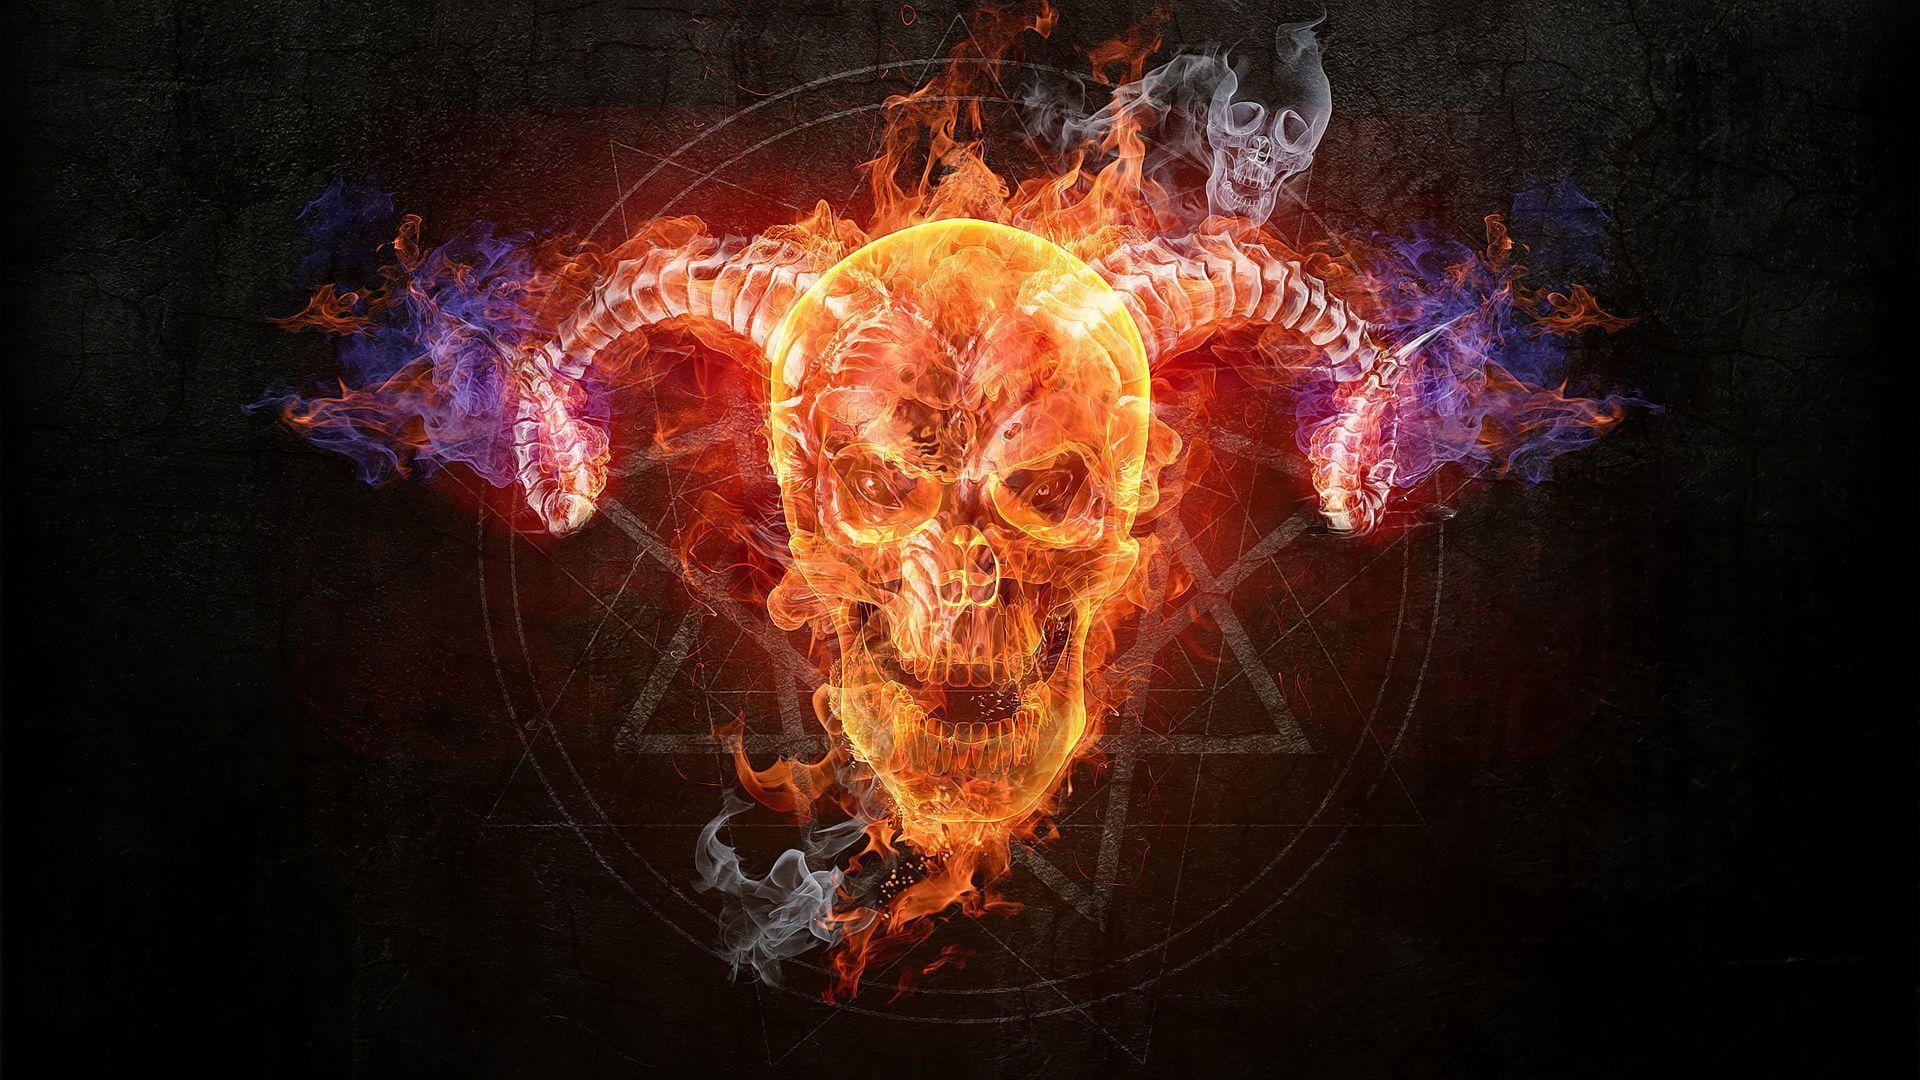 Flaming Skull Wallpapers Top Free Flaming Skull